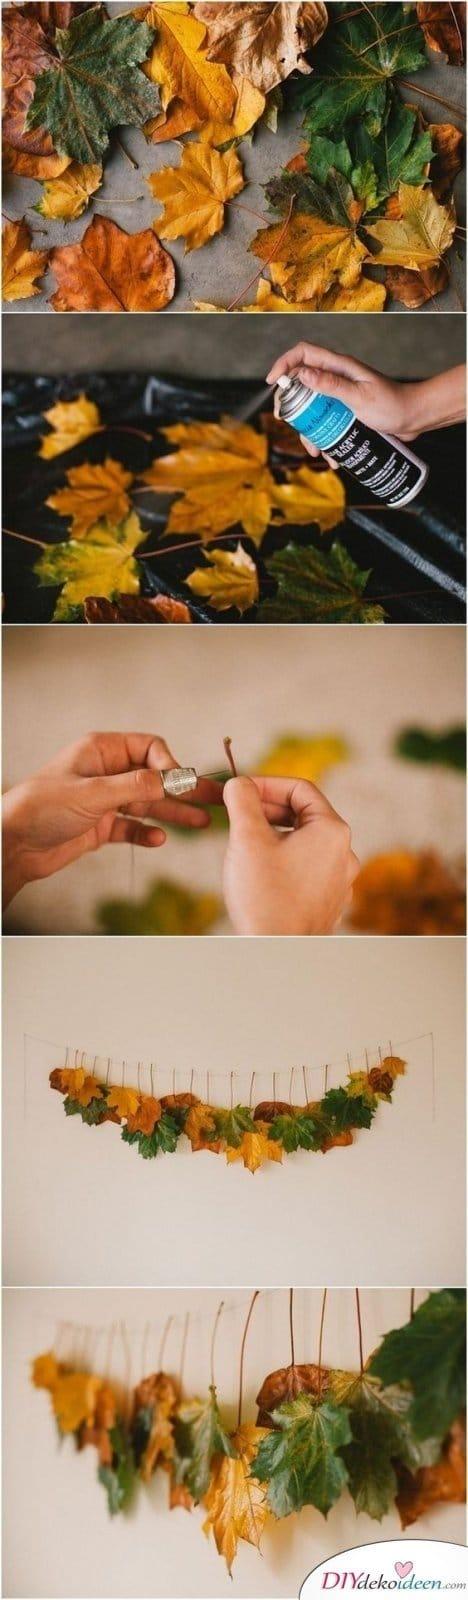 Herbstdeko basteln -DIY Bastelideen - Herbstblätter basteln